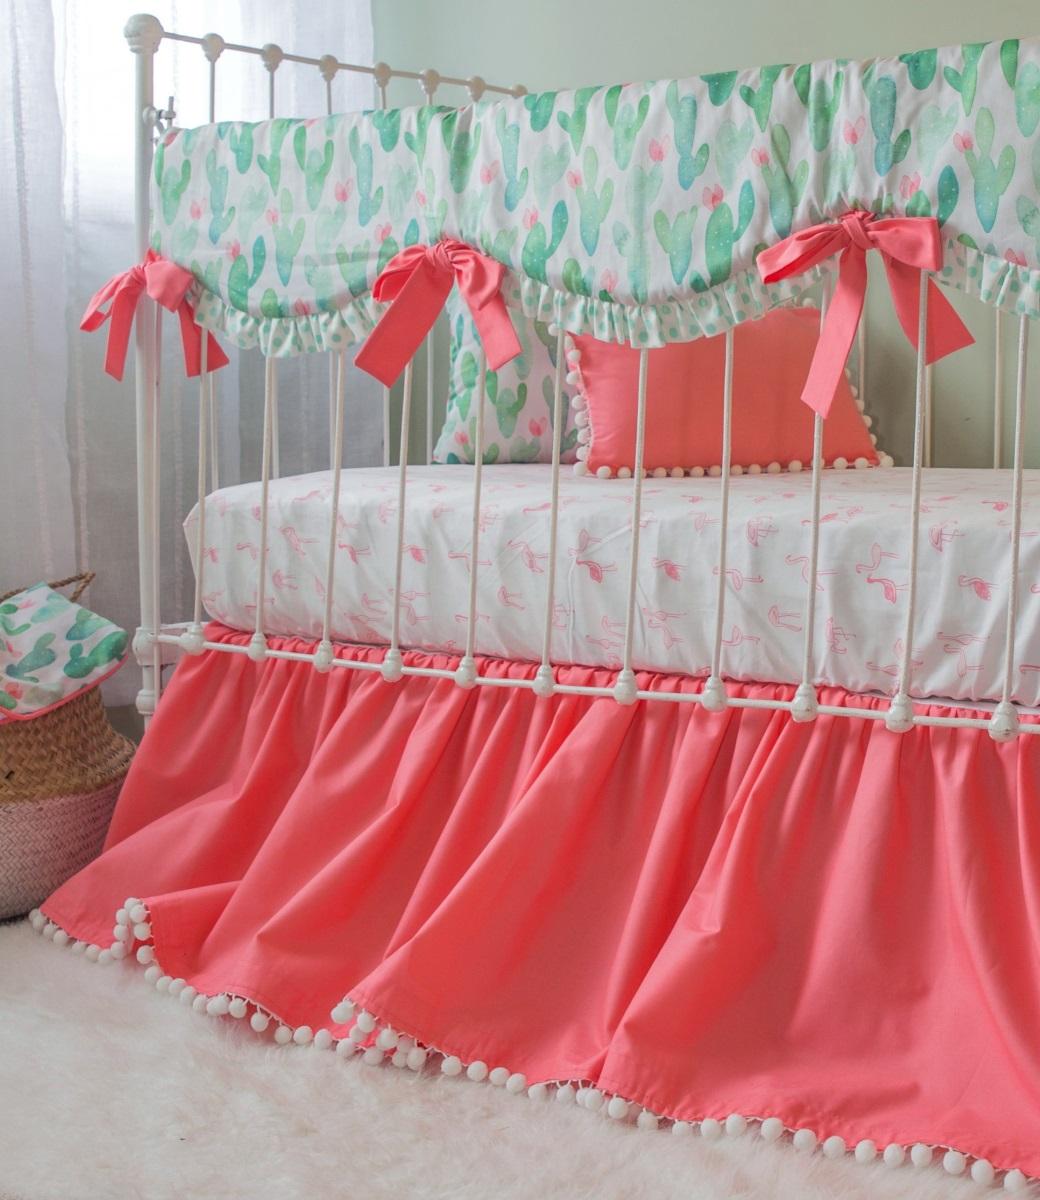 Watercolor Cactus Bumperless Baby Bedding Lottie Da Baby